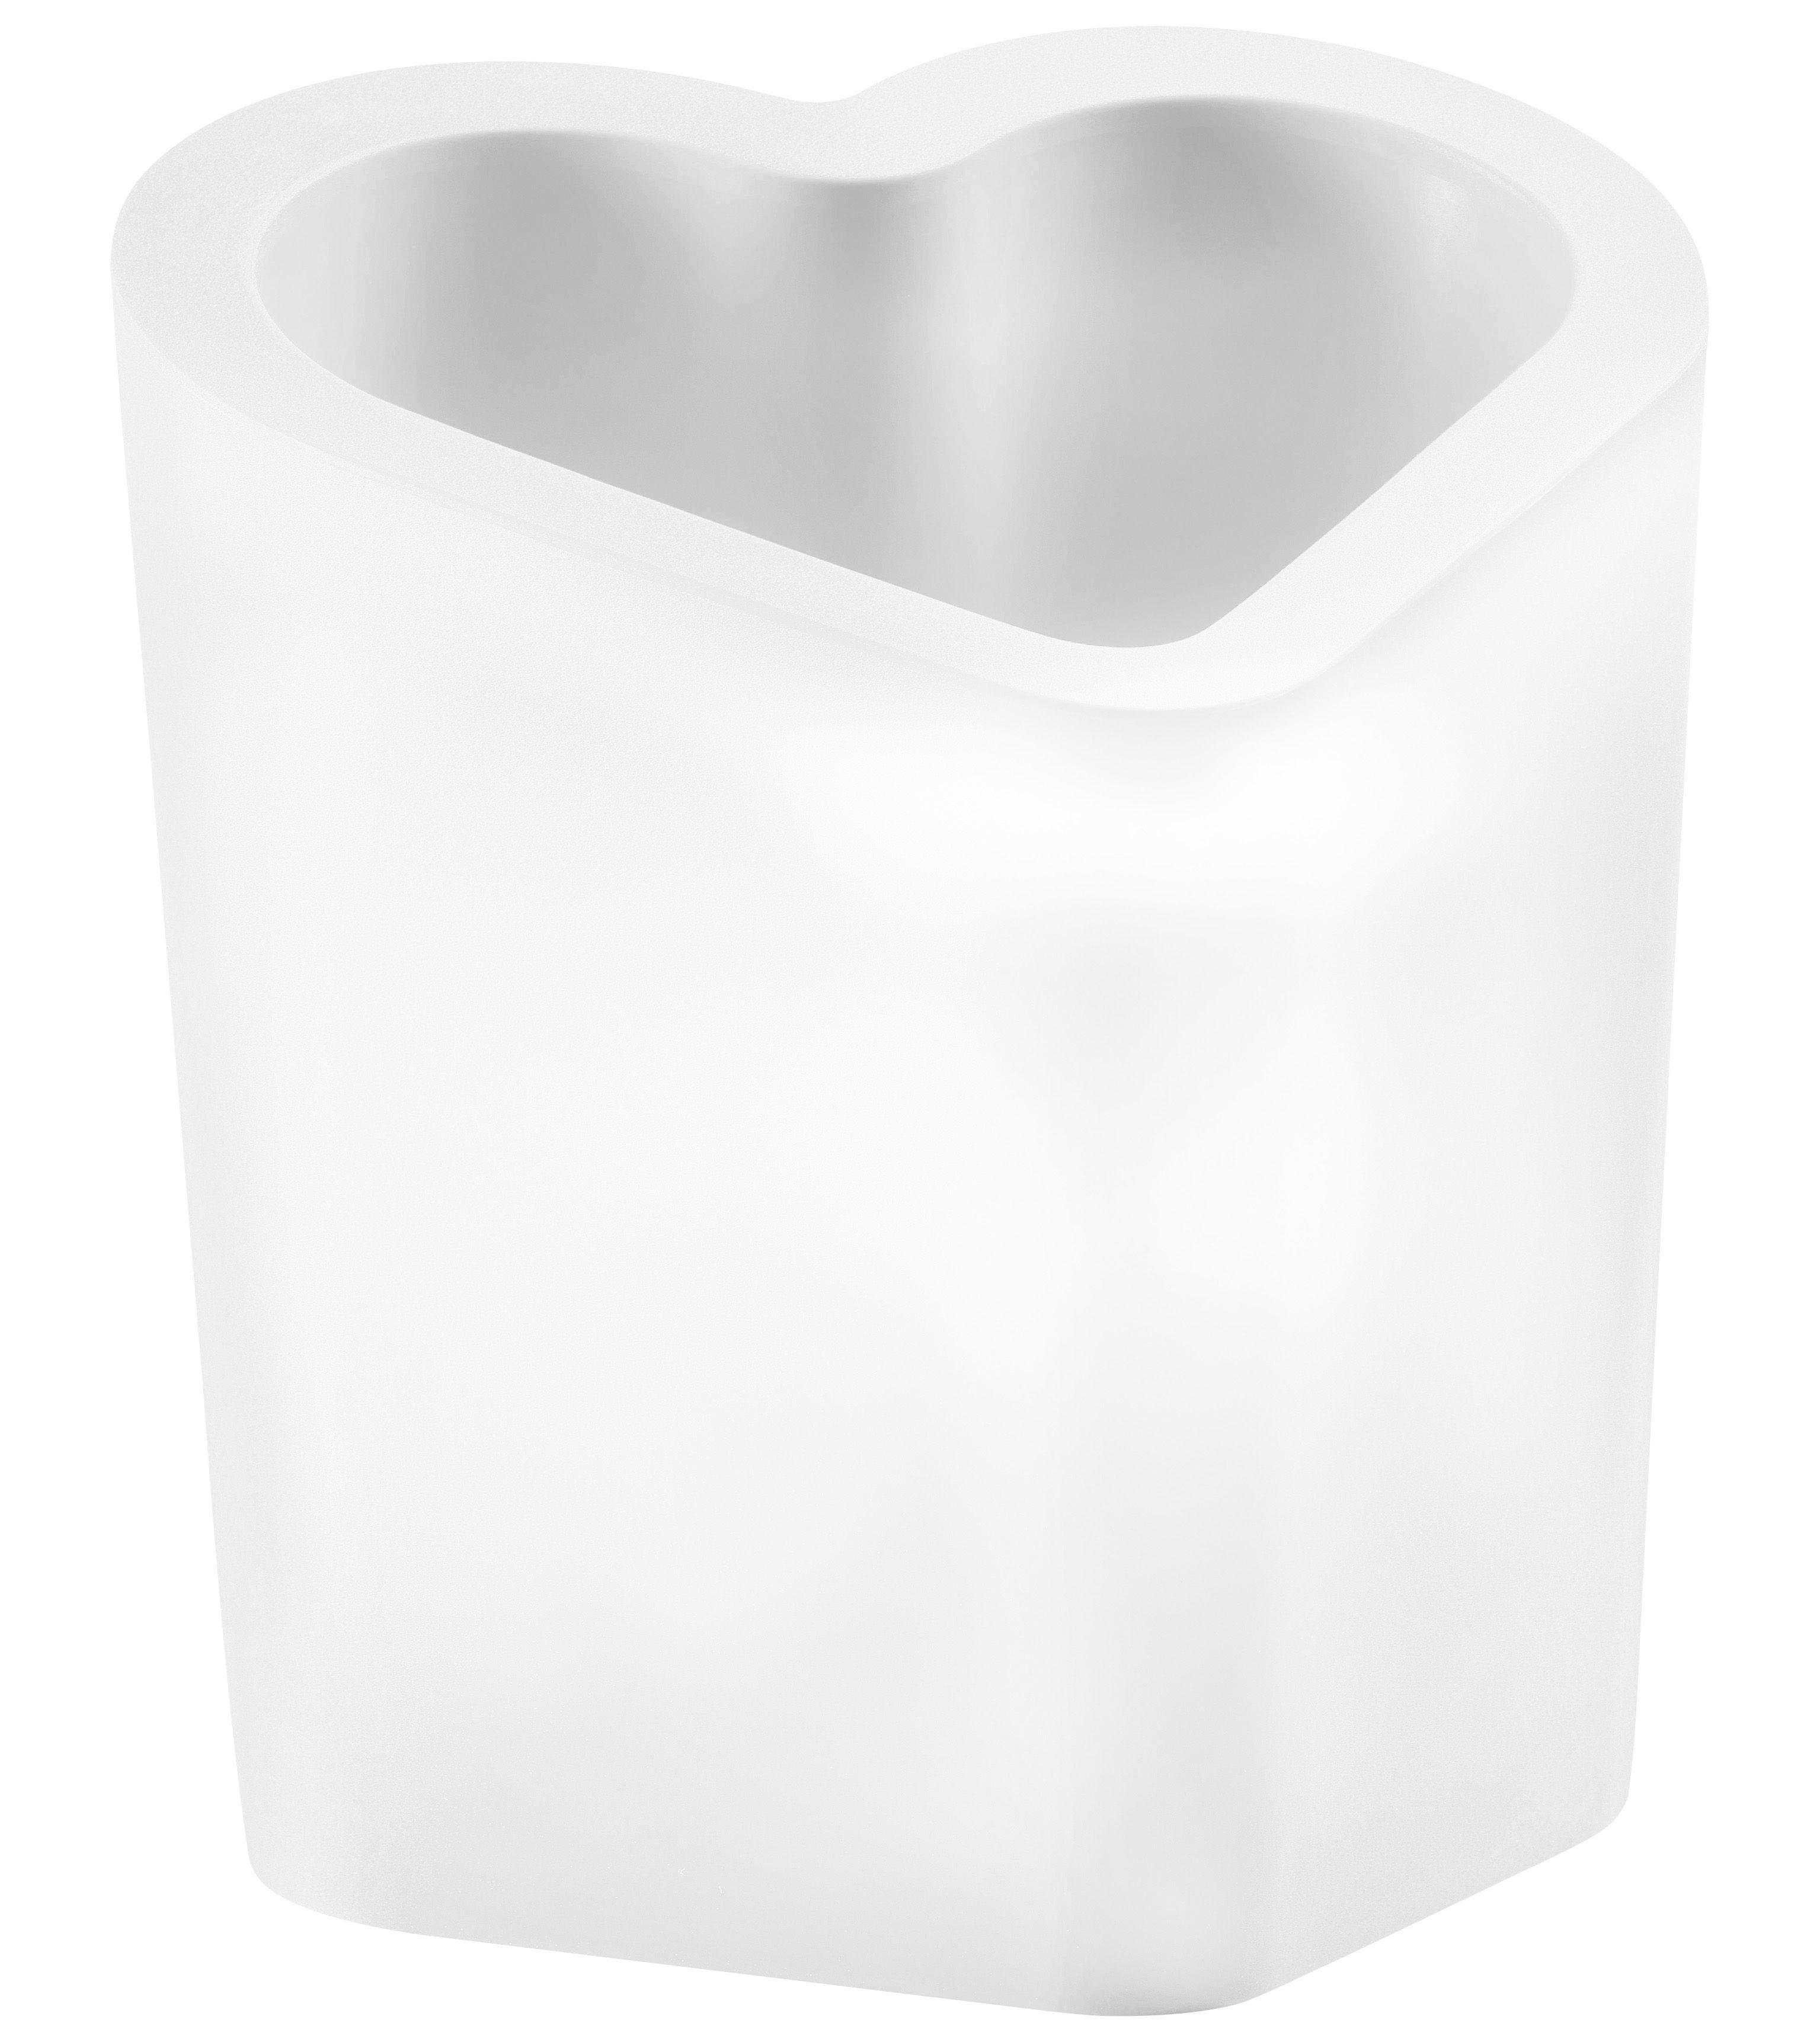 Furniture - Illuminated Furniture & Light UP Tables - Mon Amour Luminous bottle holder - Luminous bar by Slide - White - Outdoor - recyclable polyethylene